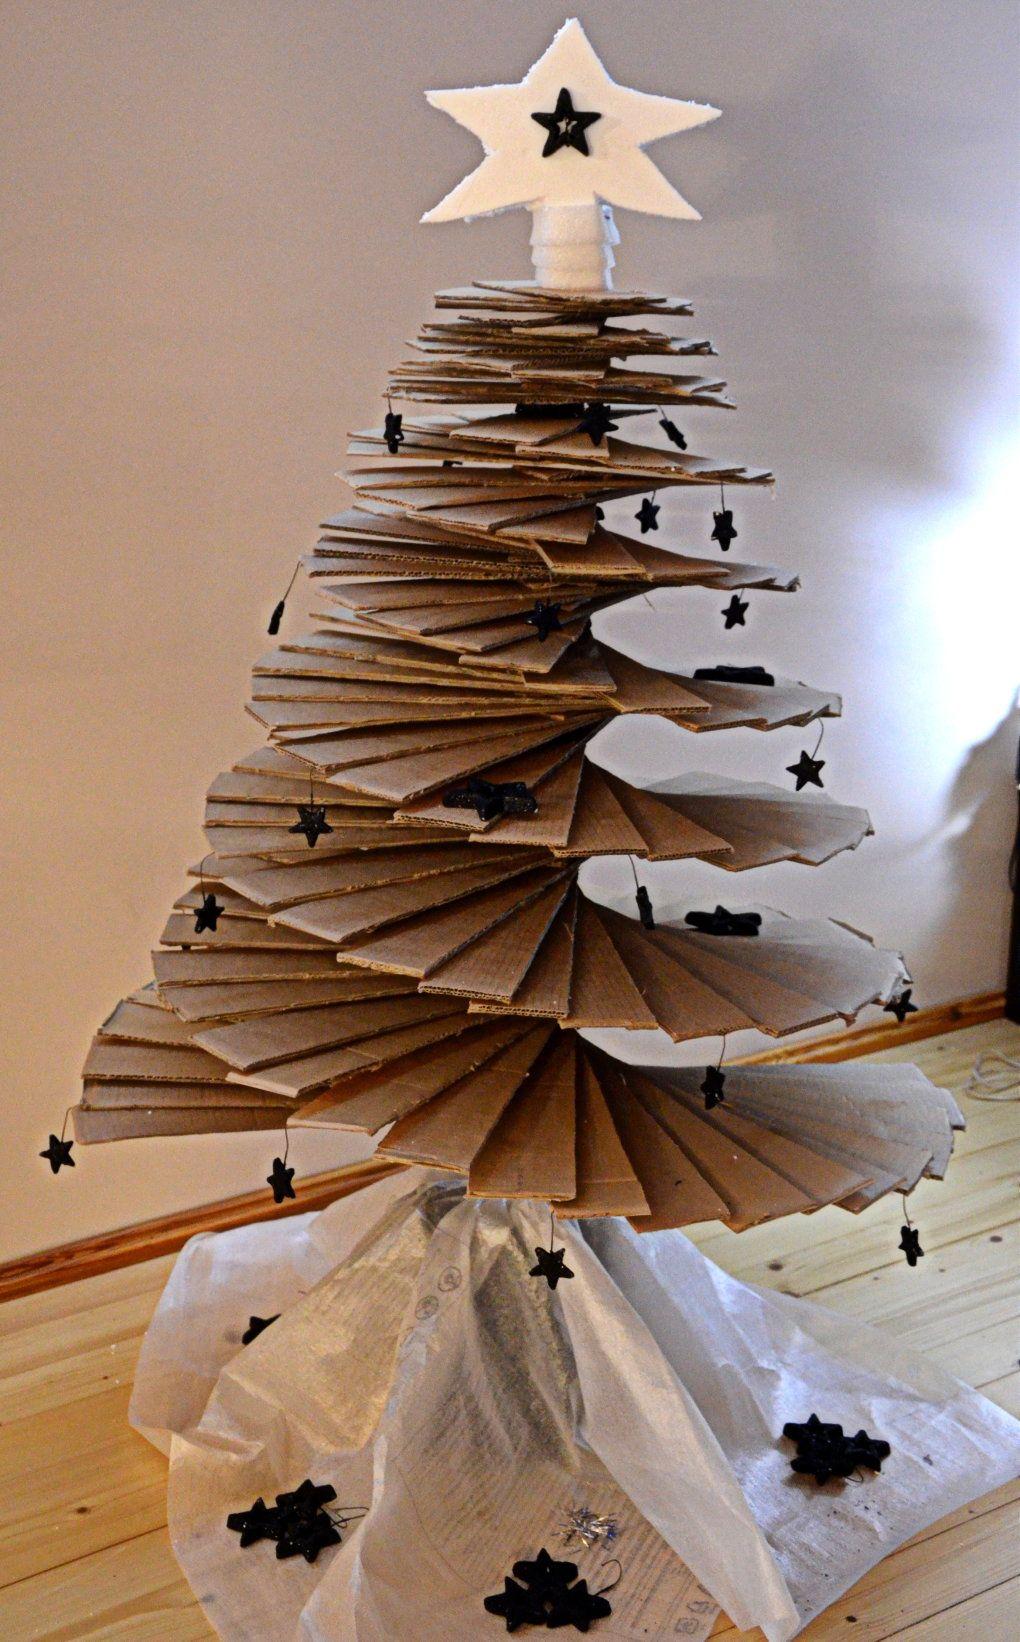 Diy Modern Cardboard Christmas Tree Sharenator Cardboard Christmas Tree How To Make Christmas Tree Diy Christmas Tree